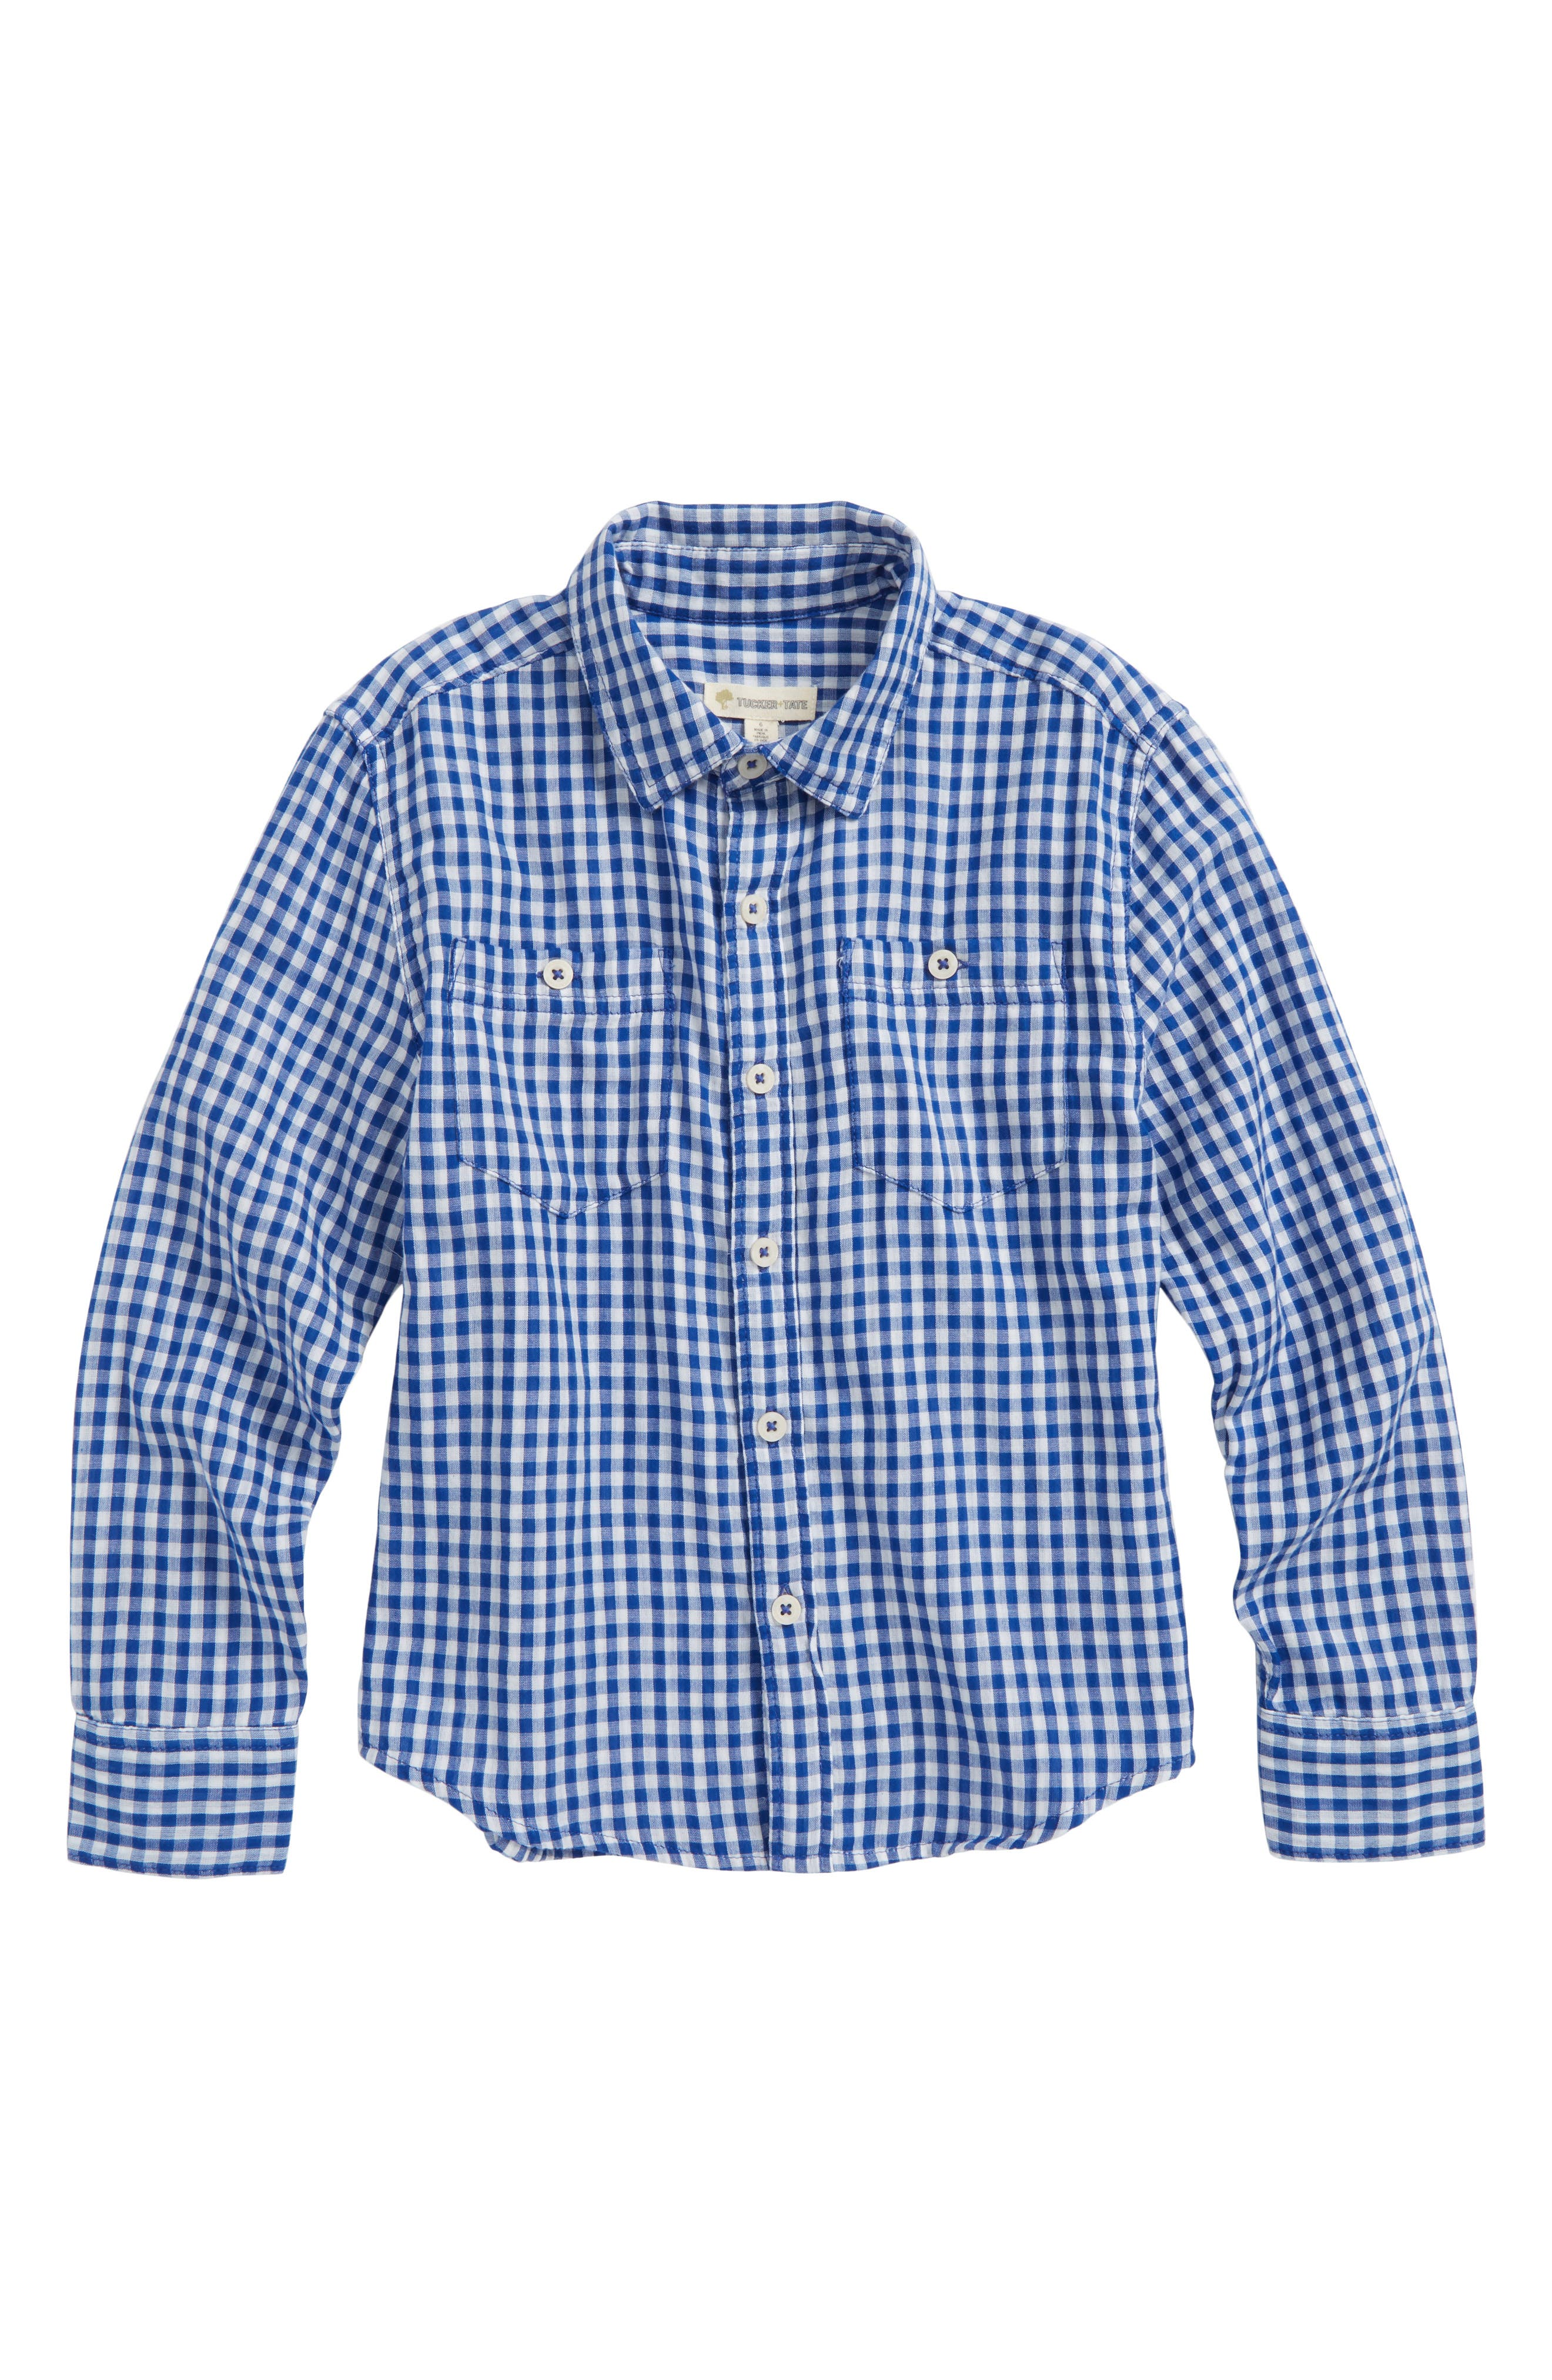 Double Cloth Shirt,                             Main thumbnail 1, color,                             420